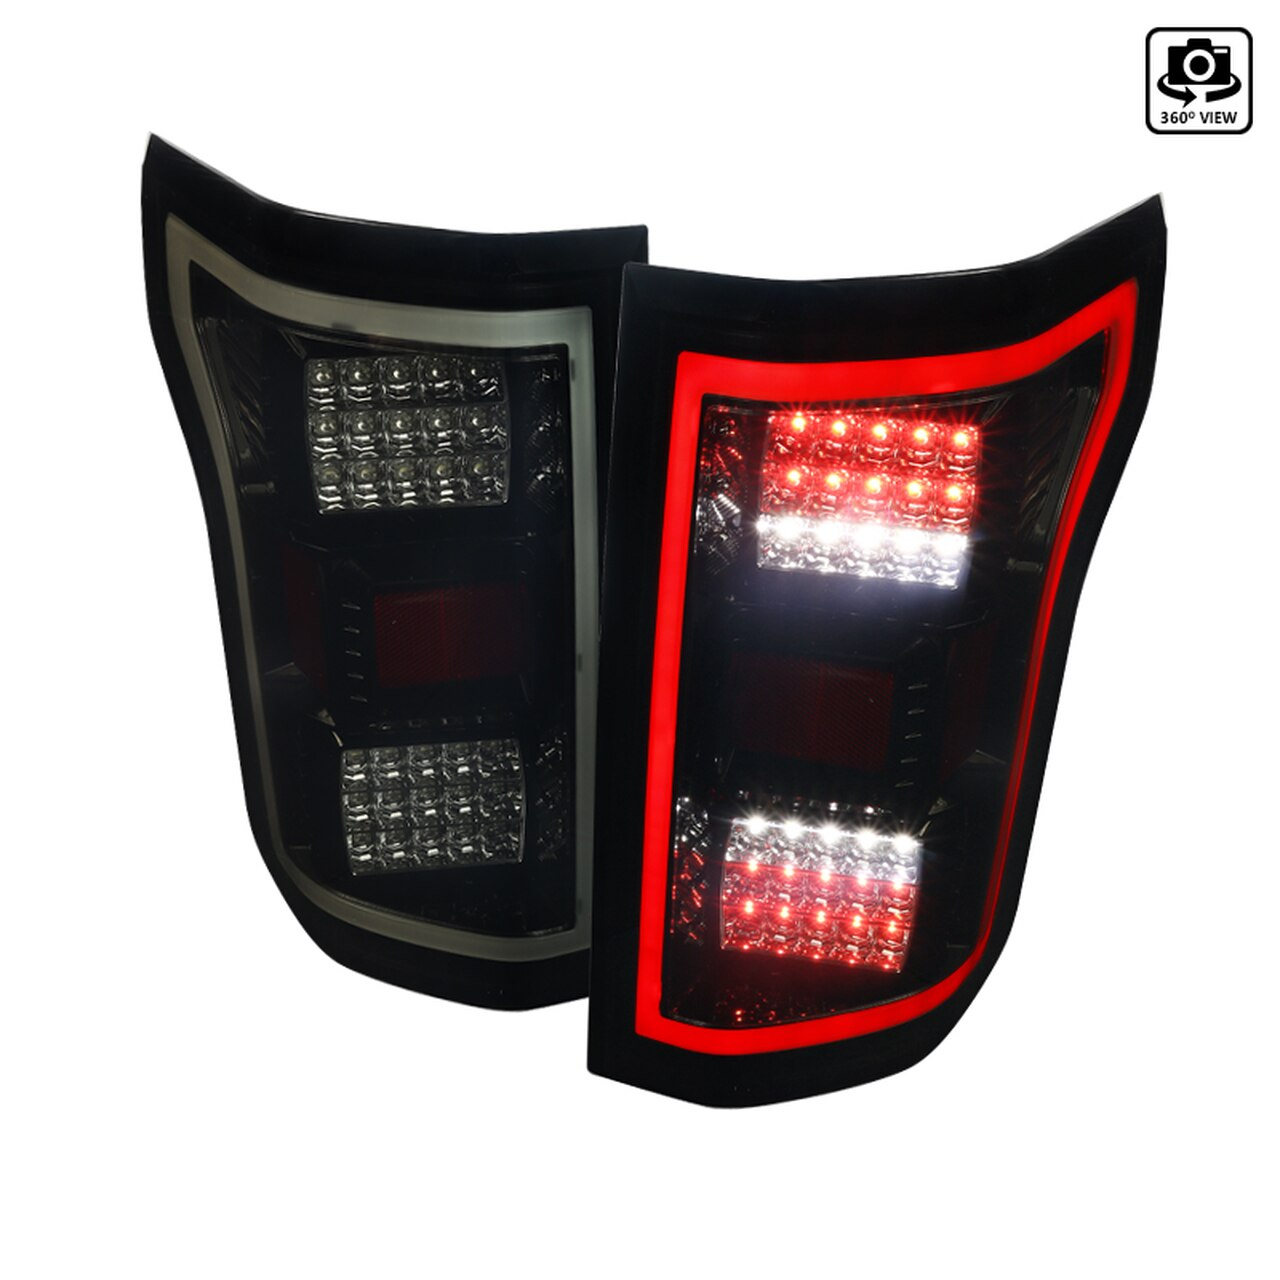 2018-2020 Ford F-150 LED Tail Lights (Glossy Black Housing/Smoke Lens)